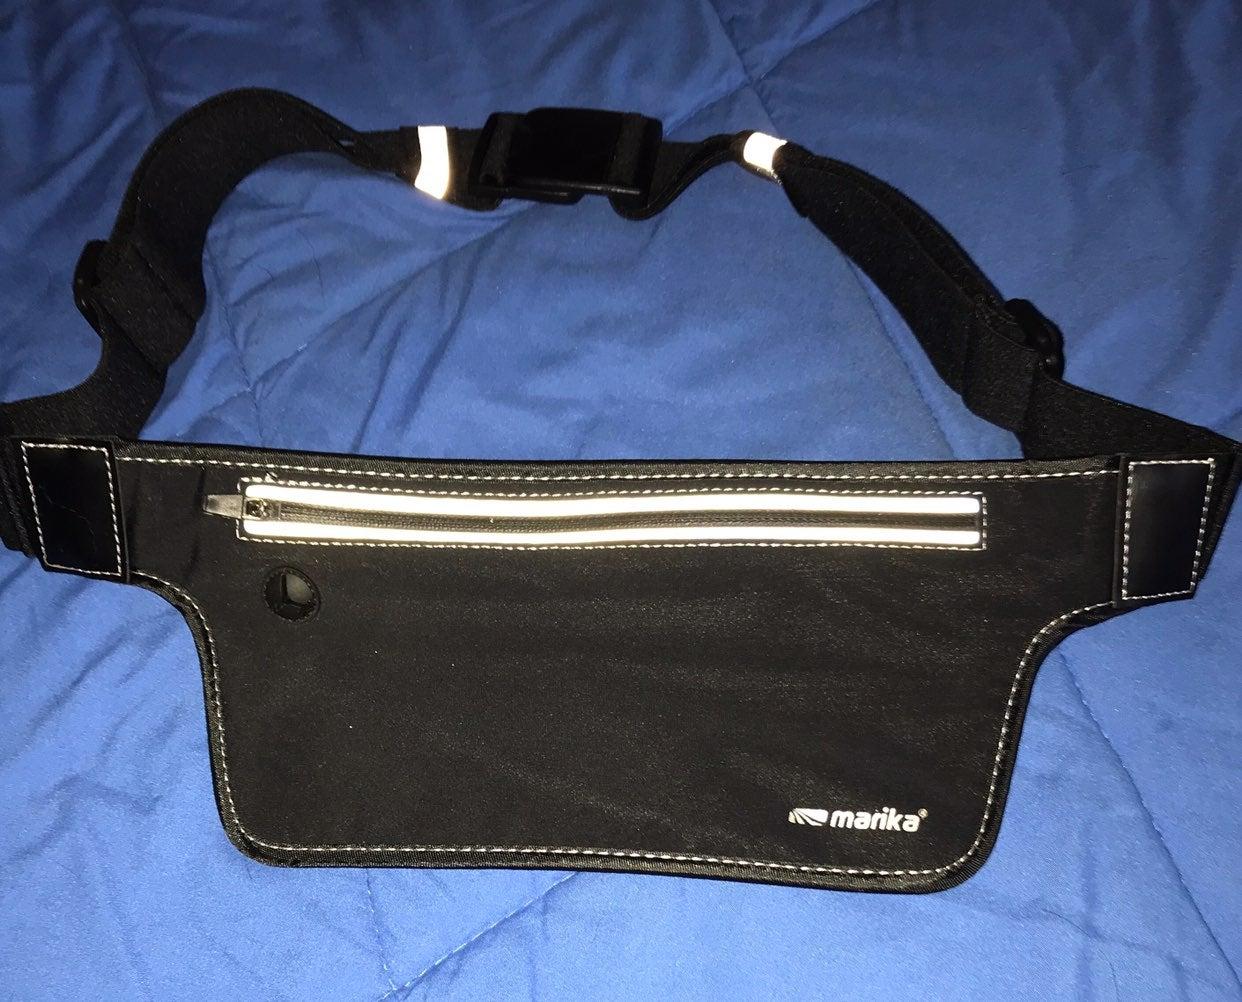 Smartphone fitness waist pack